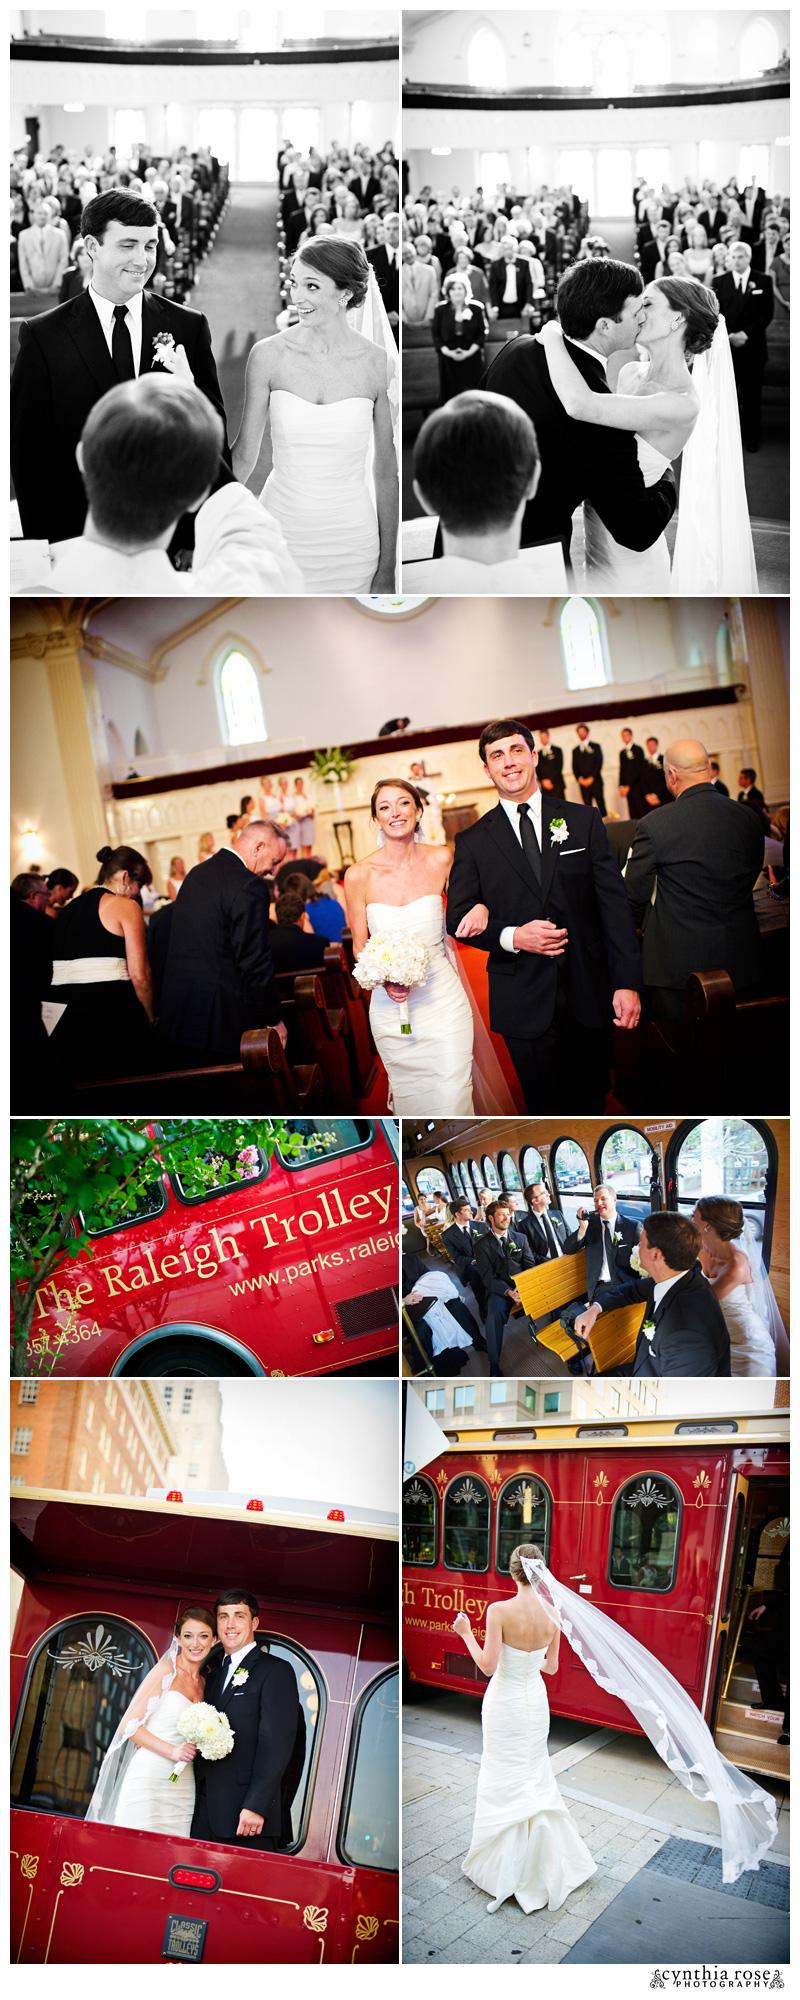 Long View Center Raleigh wedding